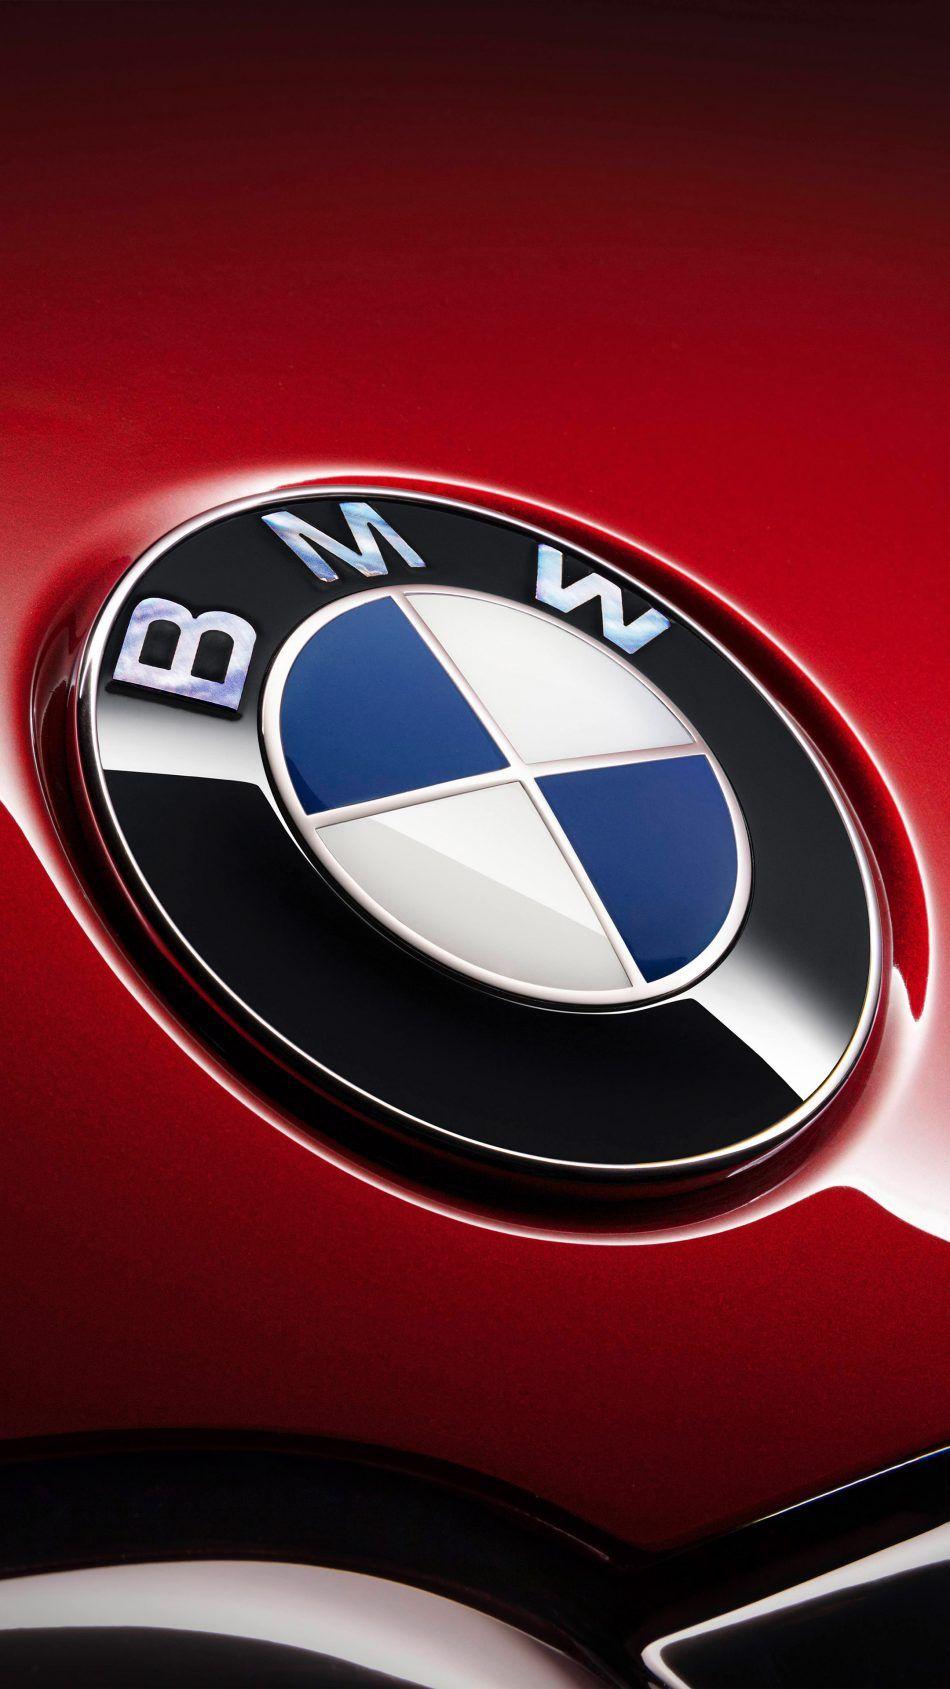 Bmw 7 Series Logo Bmw Wallpapers Bmw Bmw Iphone Wallpaper